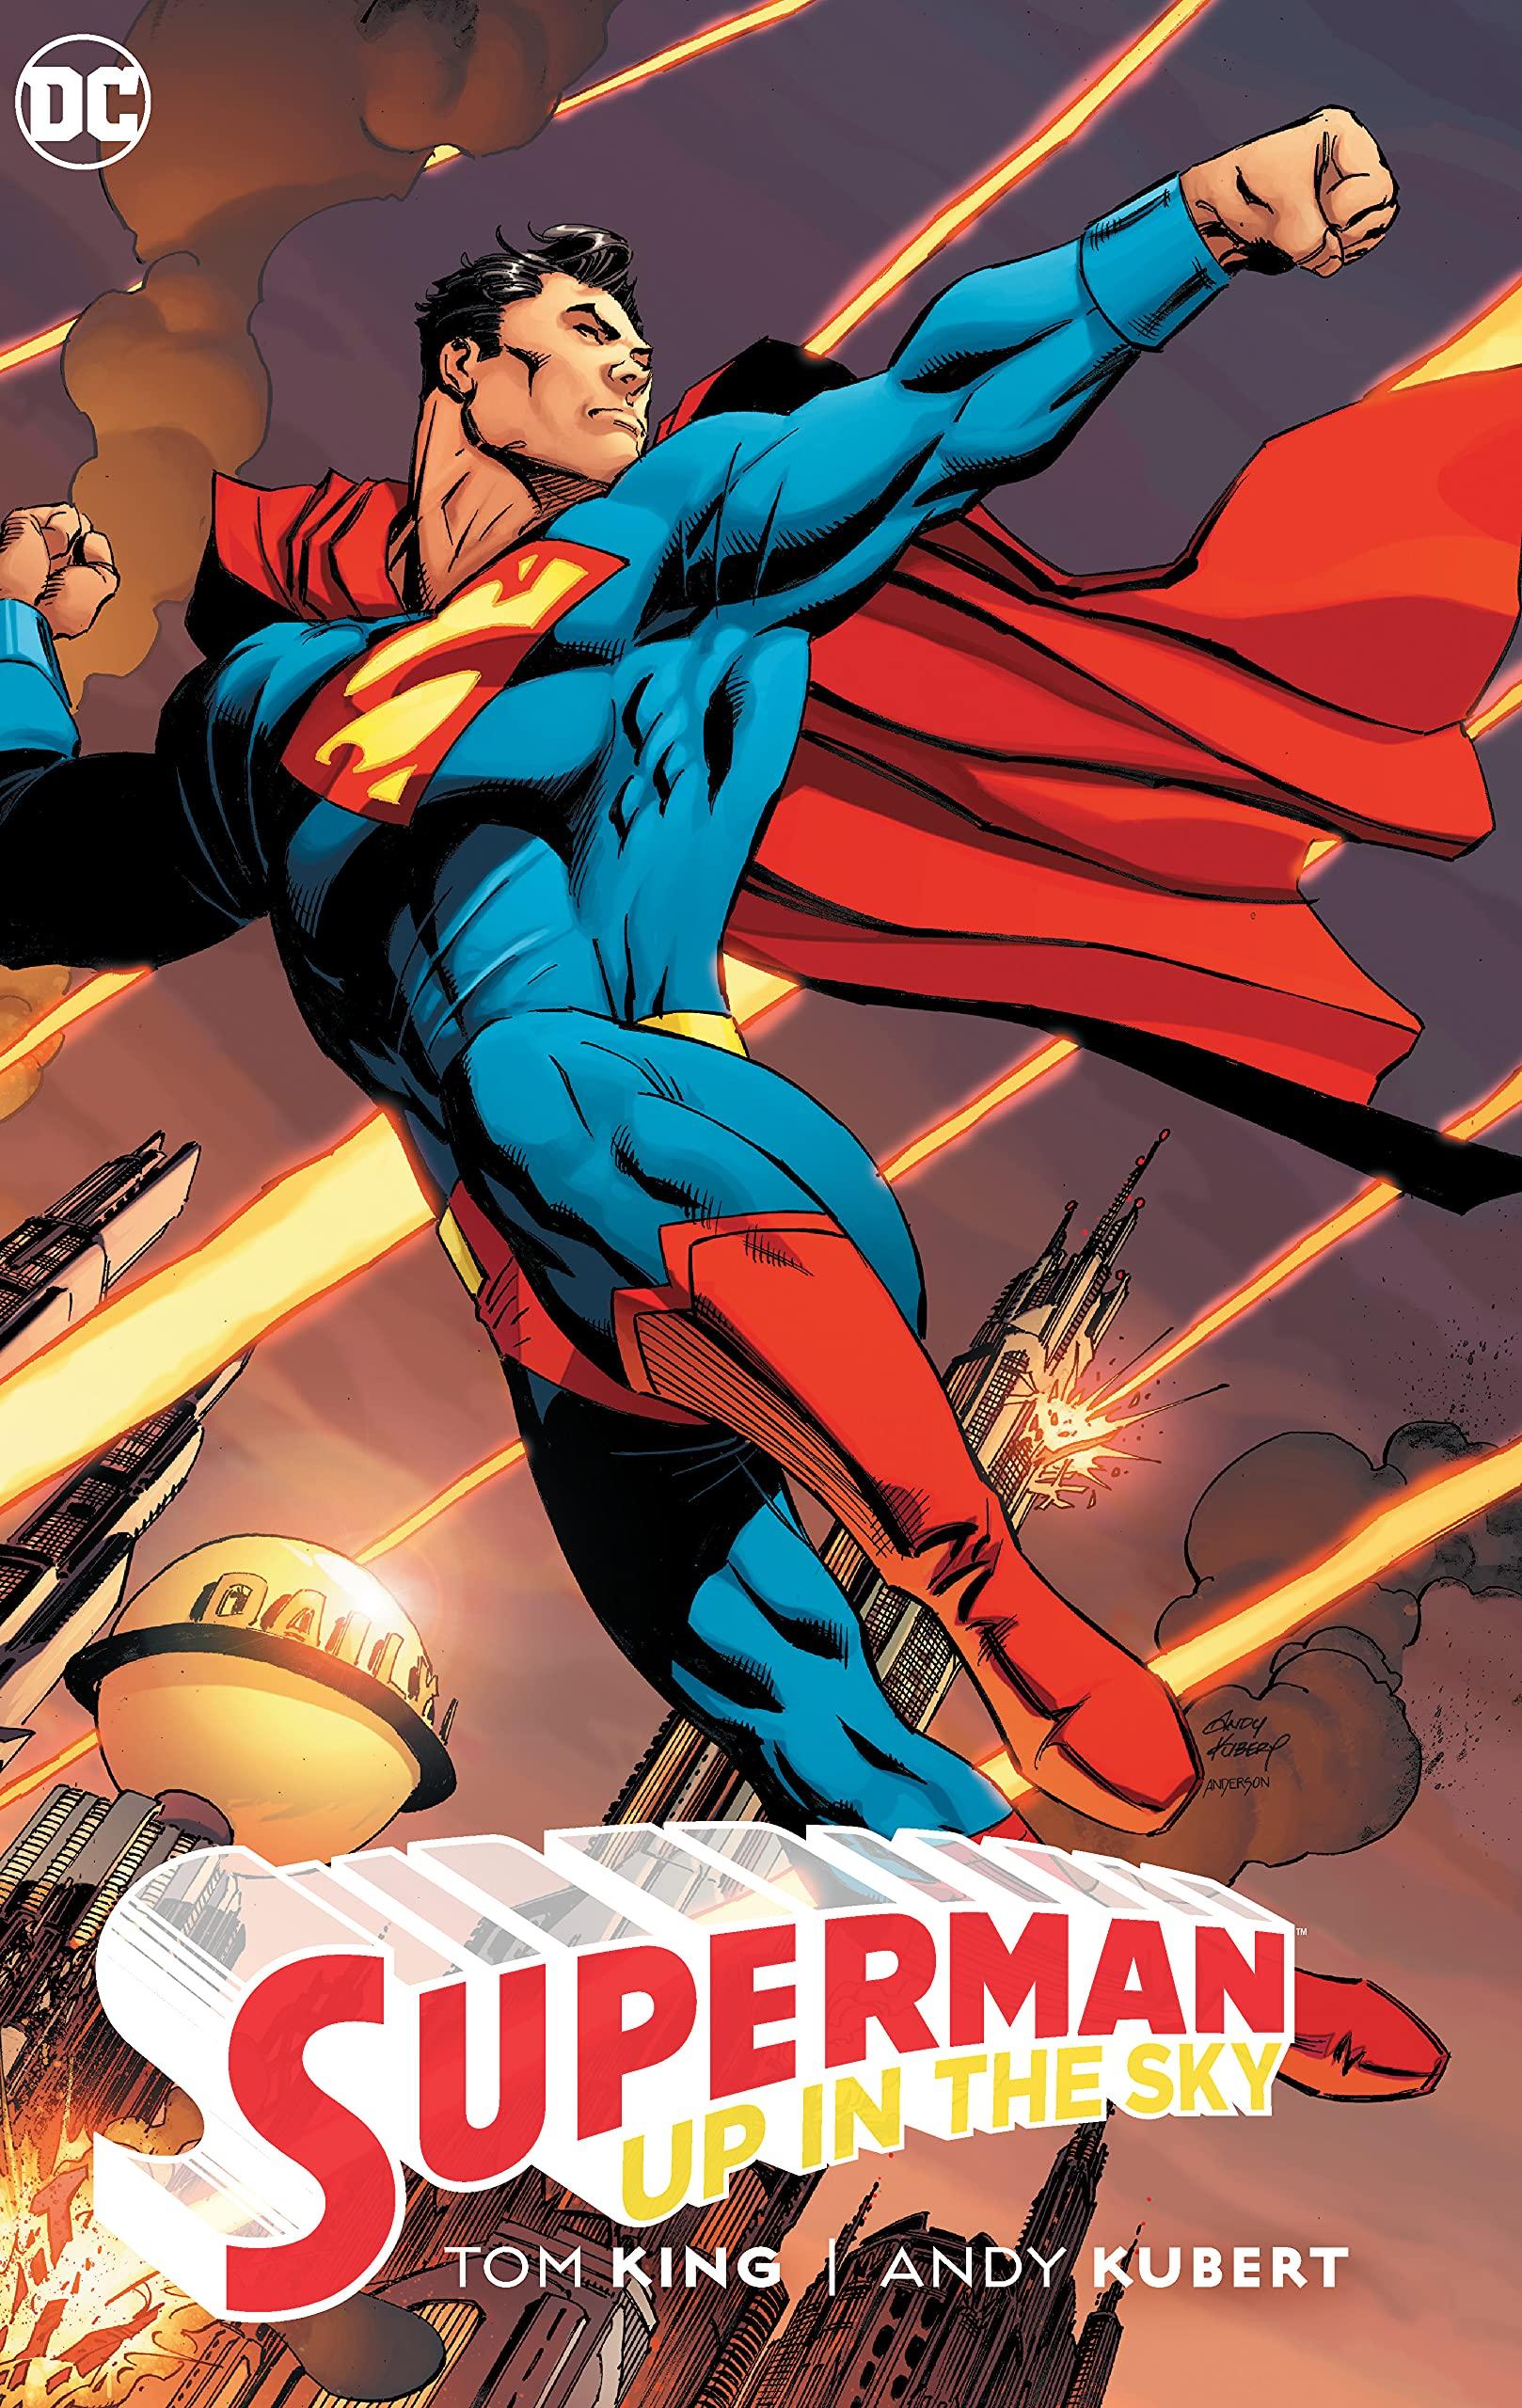 Leer Superman Up In the Sky / Arriba en el cielo online en español